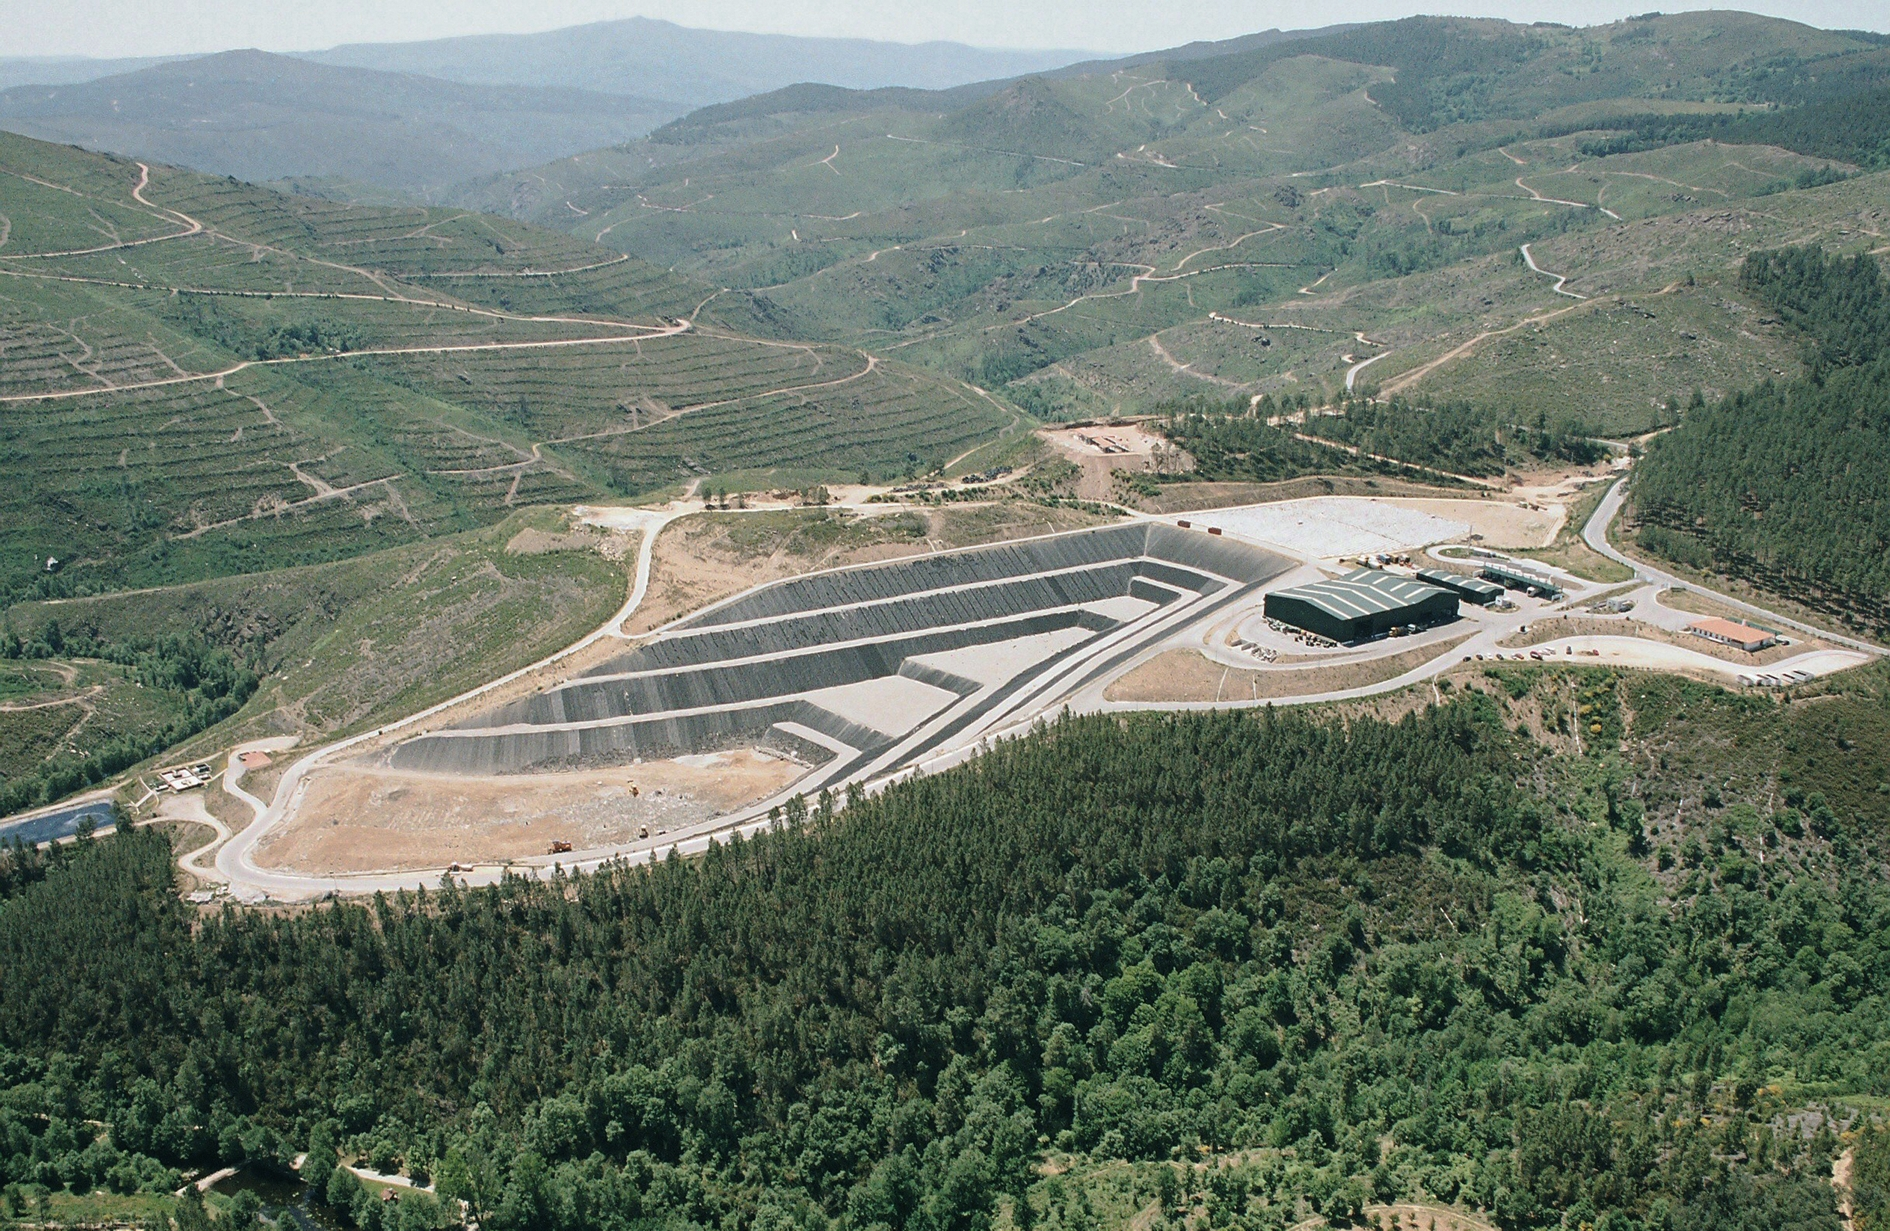 Project for the Alto Tâmega Landfill